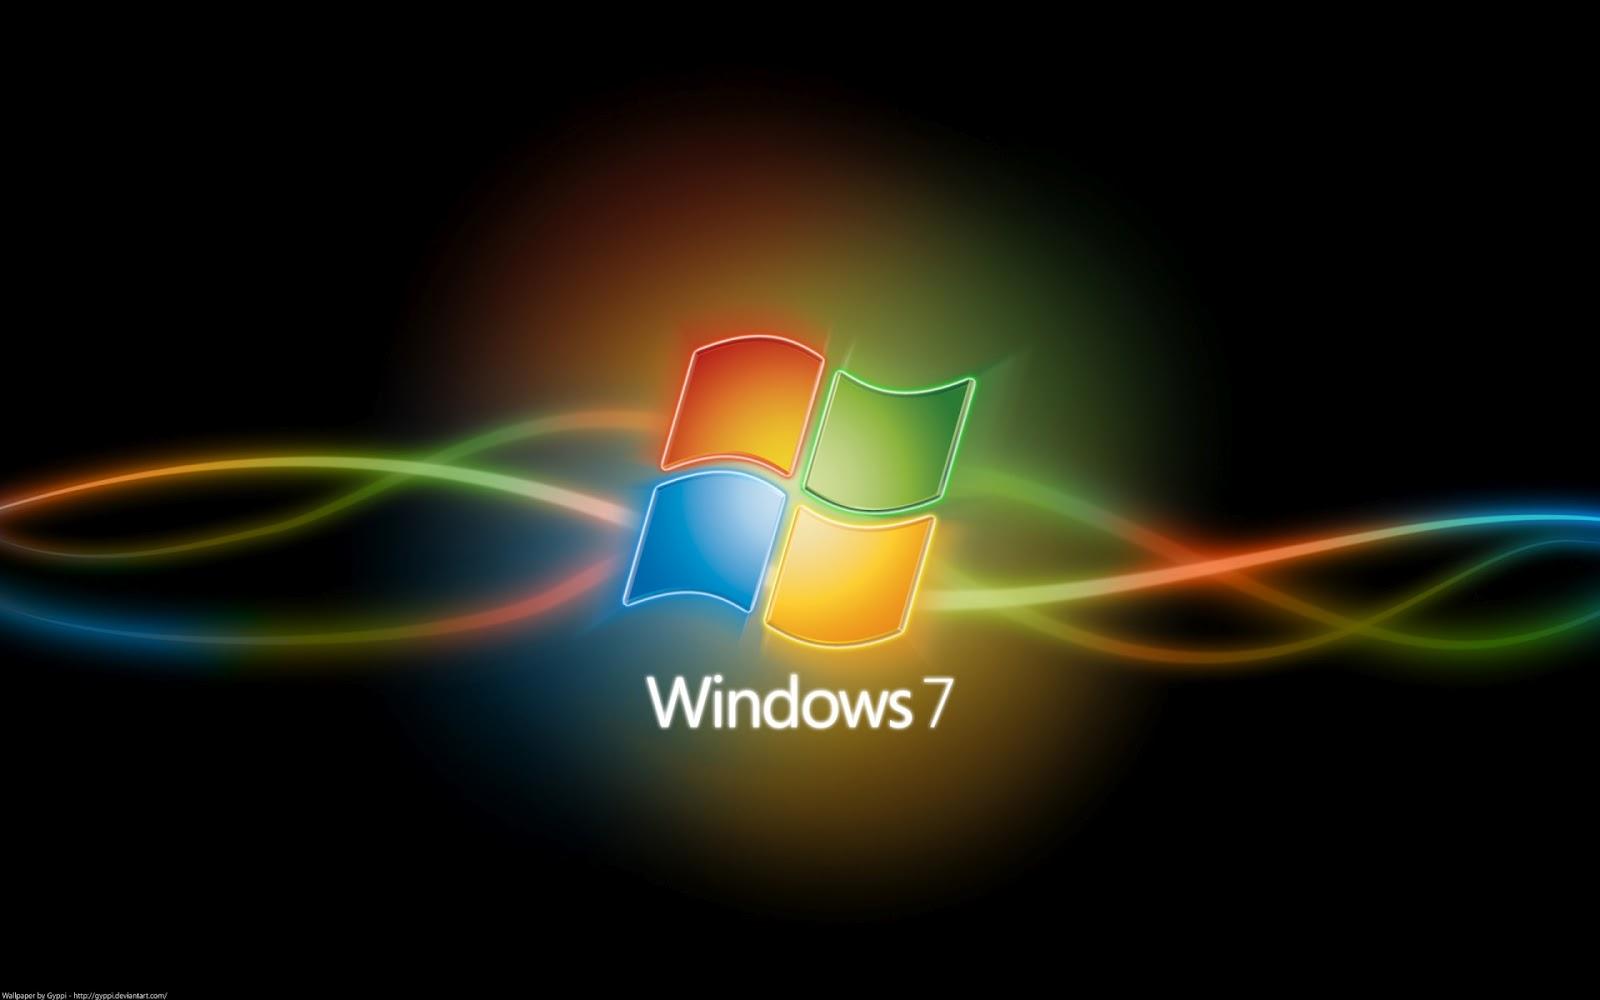 download free flash games for windows 7 laptop